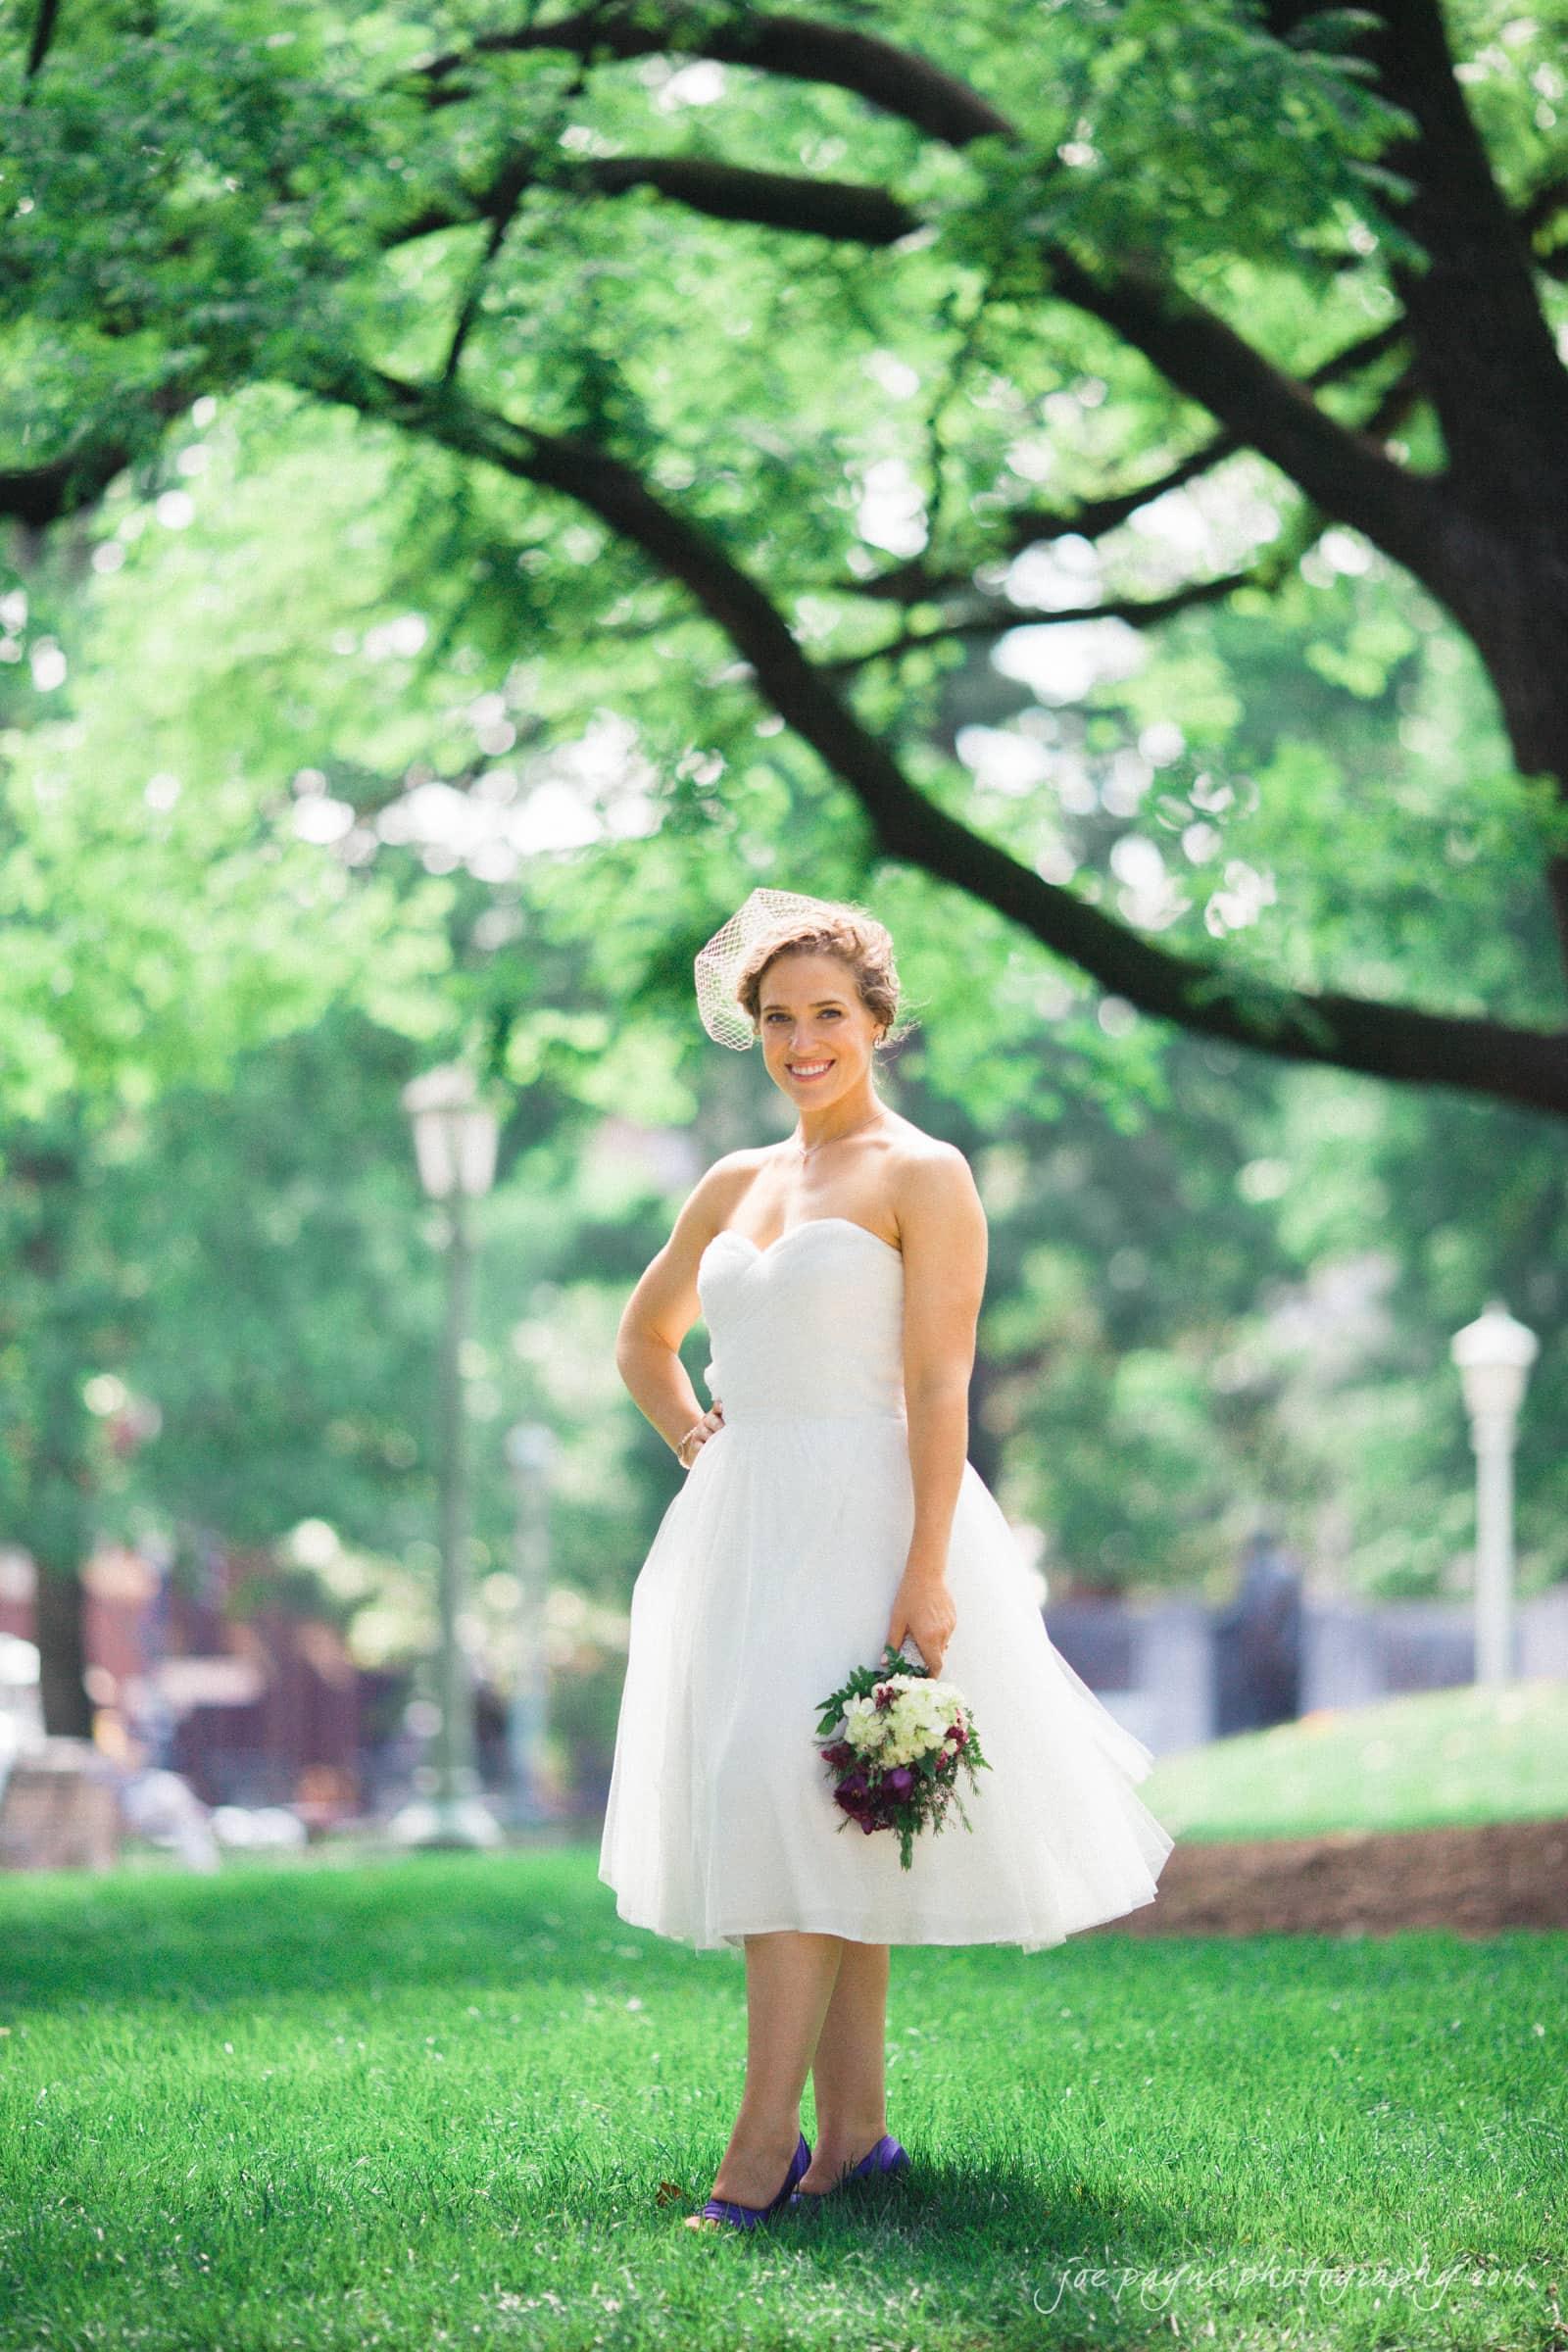 Downtown Raleigh Wedding Photographer - Alexandra & Trent -24